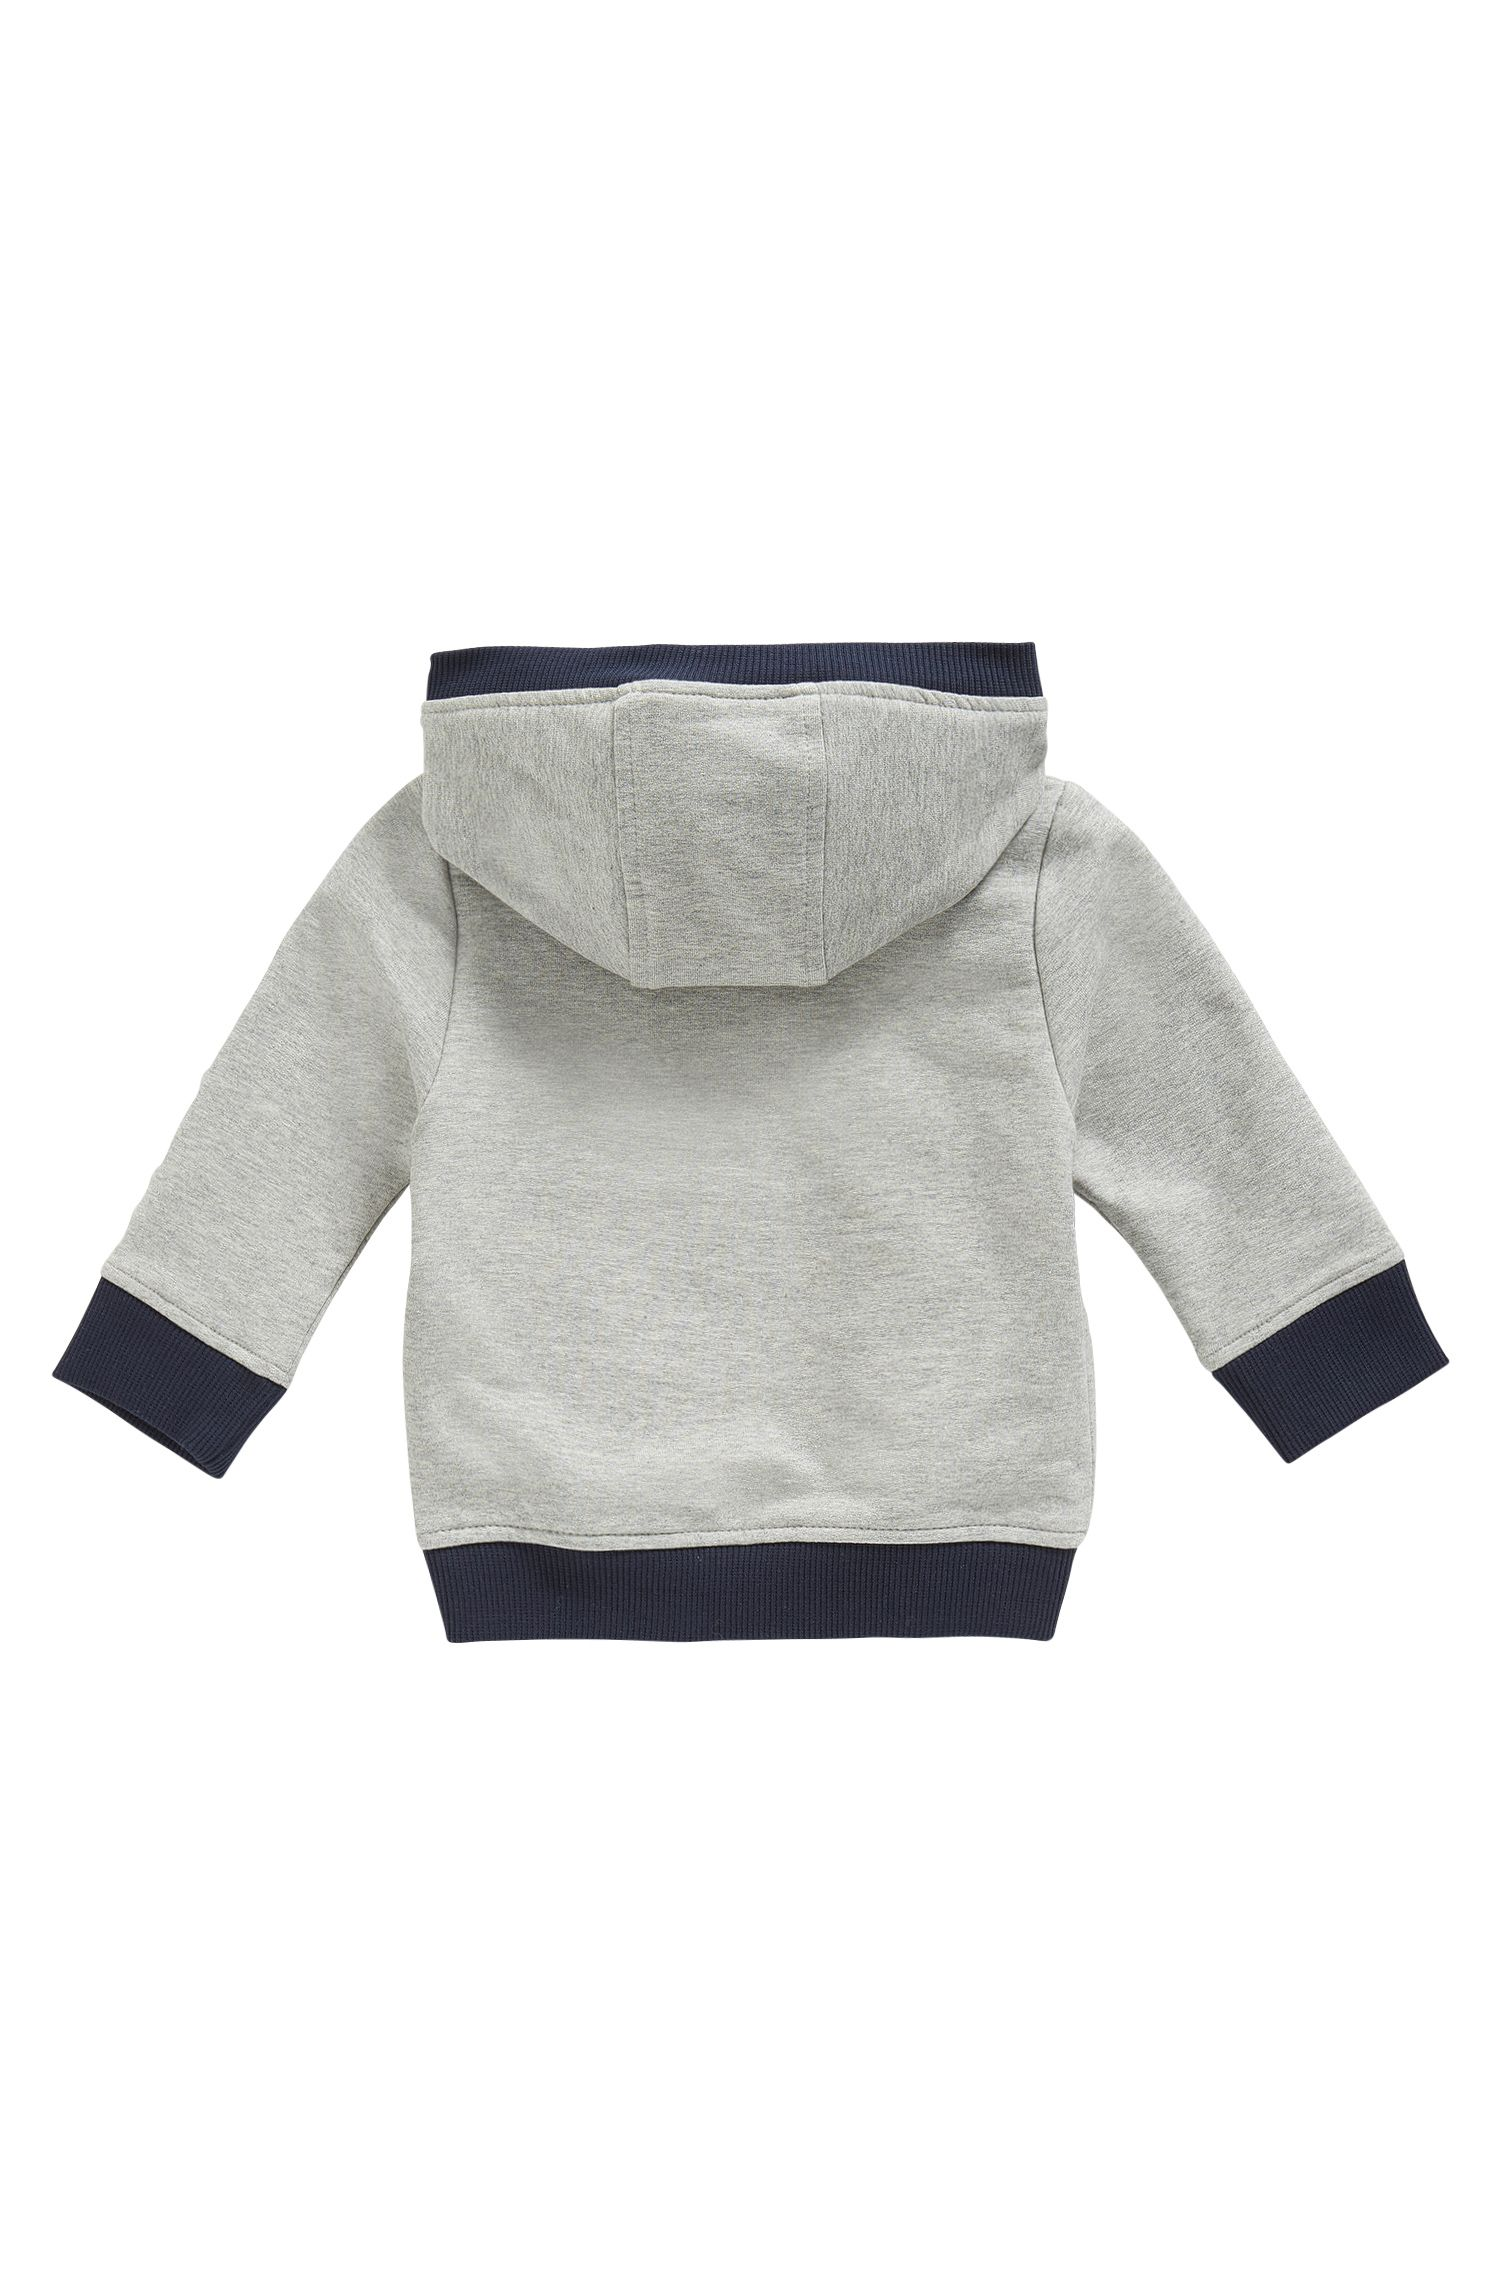 Kids-Kapuzenjacke aus Stretch-Baumwolle, Hellgrau